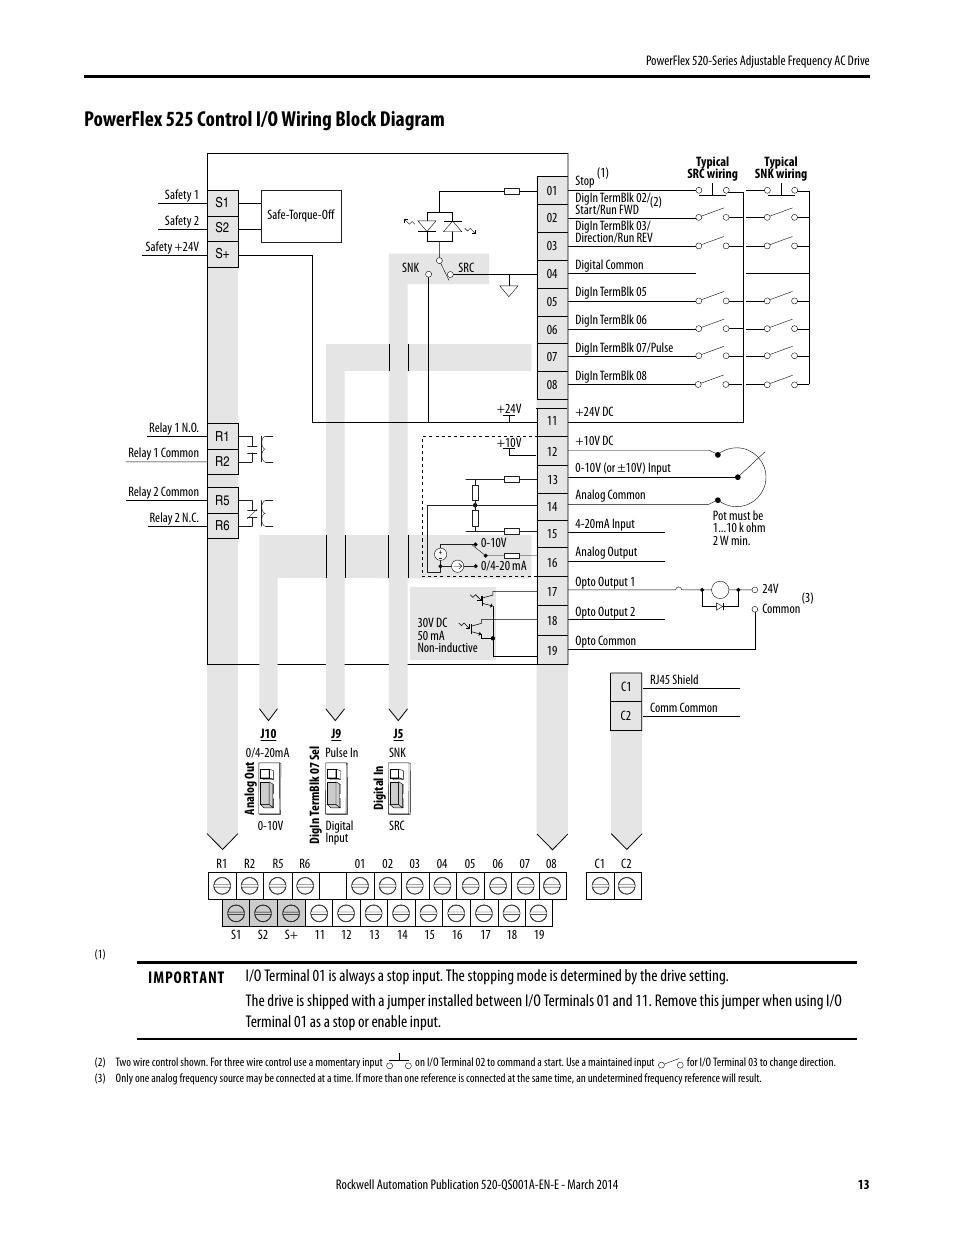 Rockwell Wiring Diagram | Wiring Diagram on